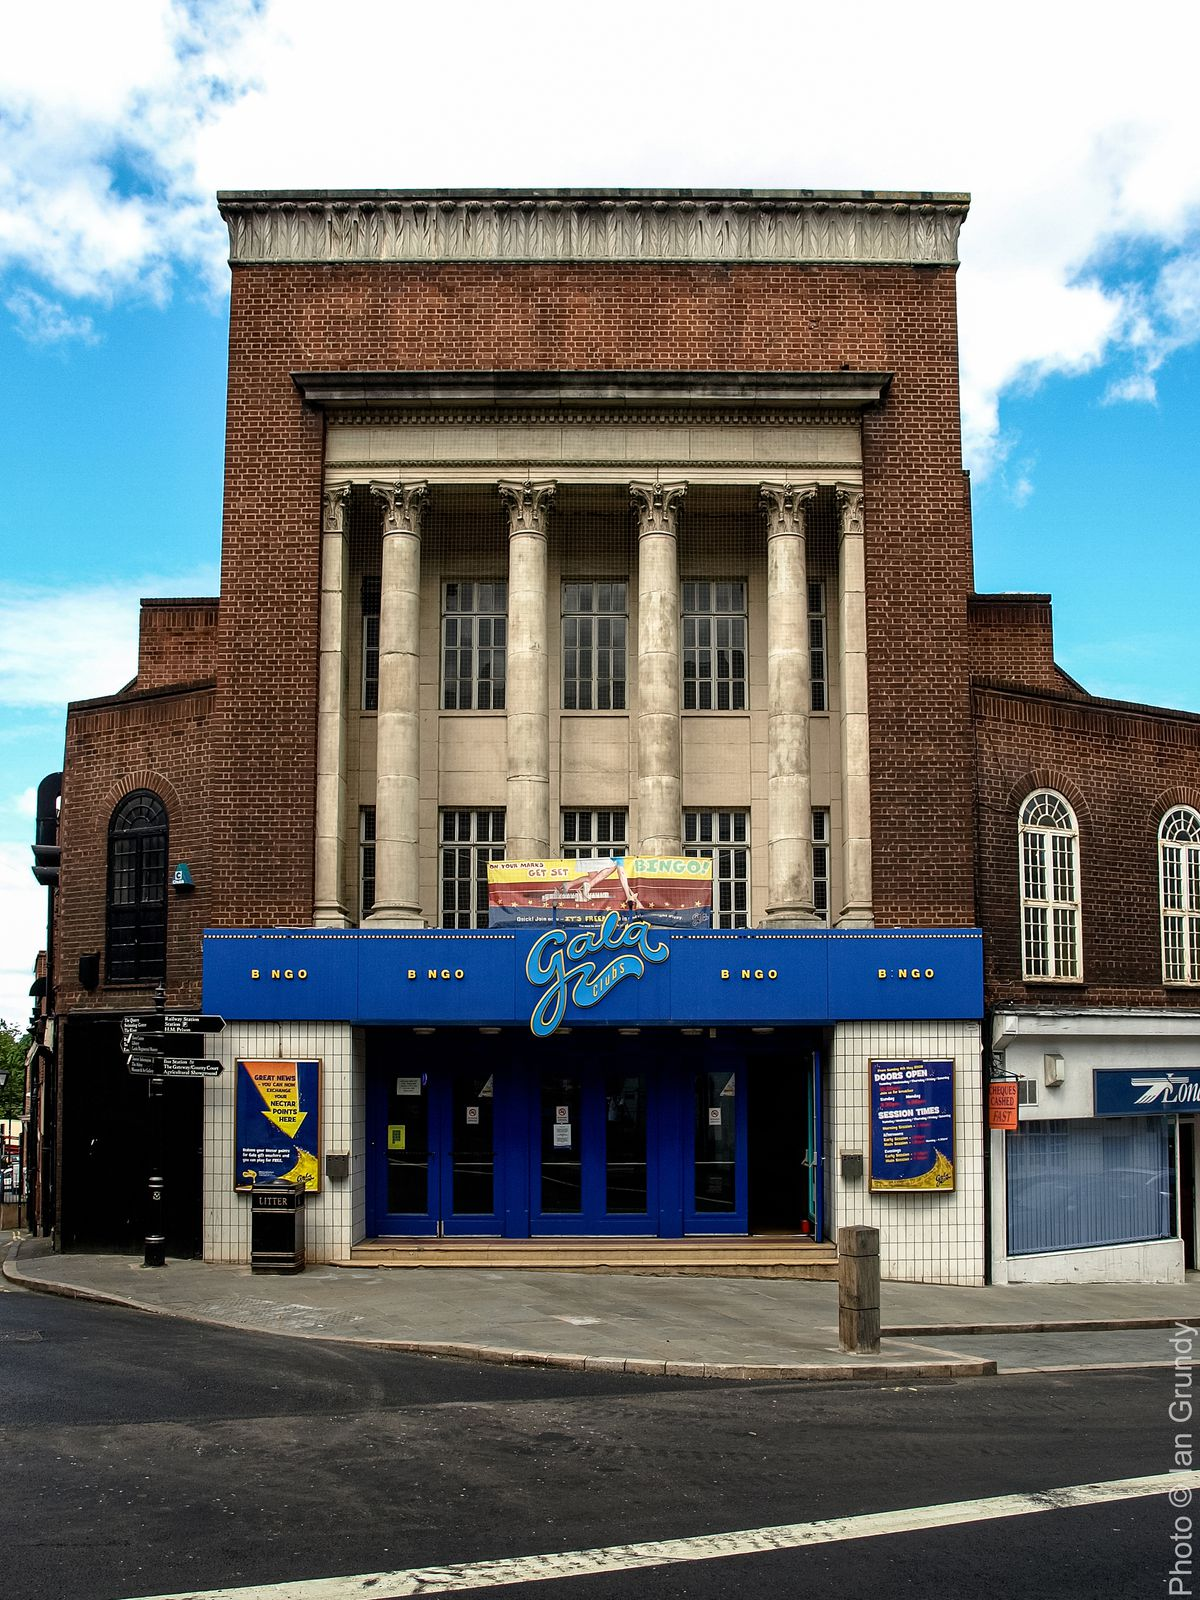 The Grade II-listed former Granada cinema in Shrewsbury